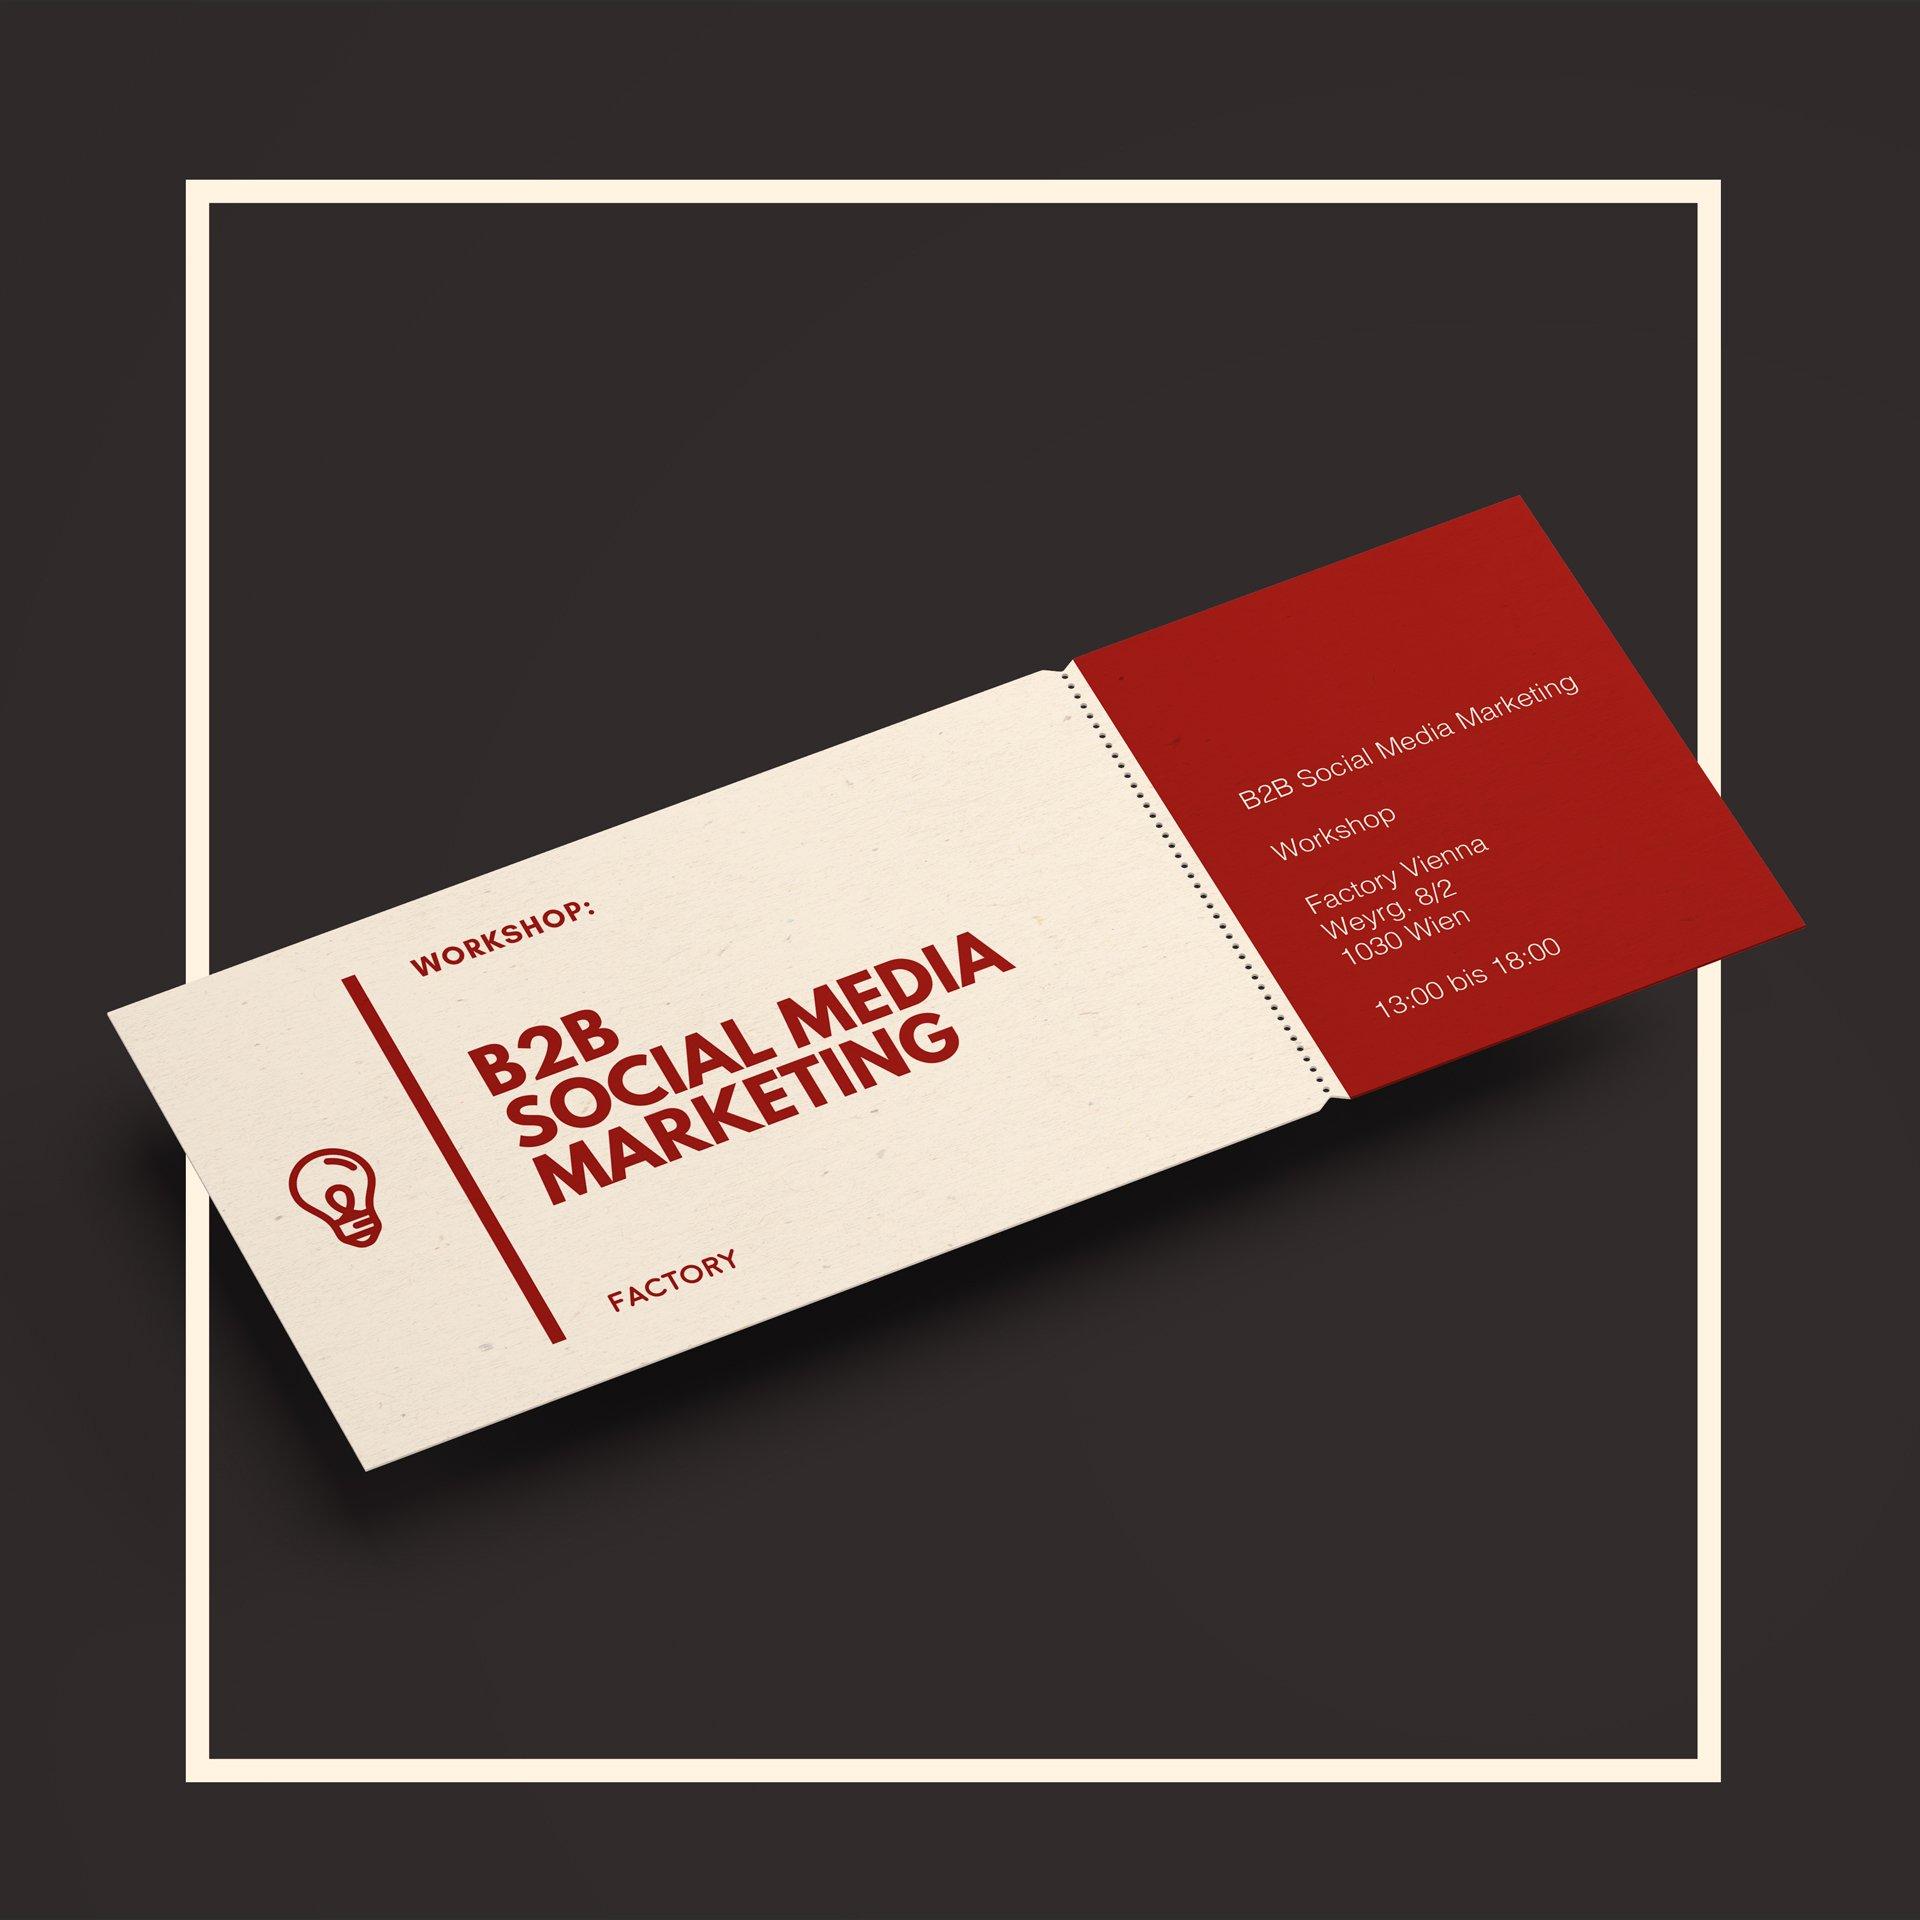 B2B_Social_Media_workshop_ticket1